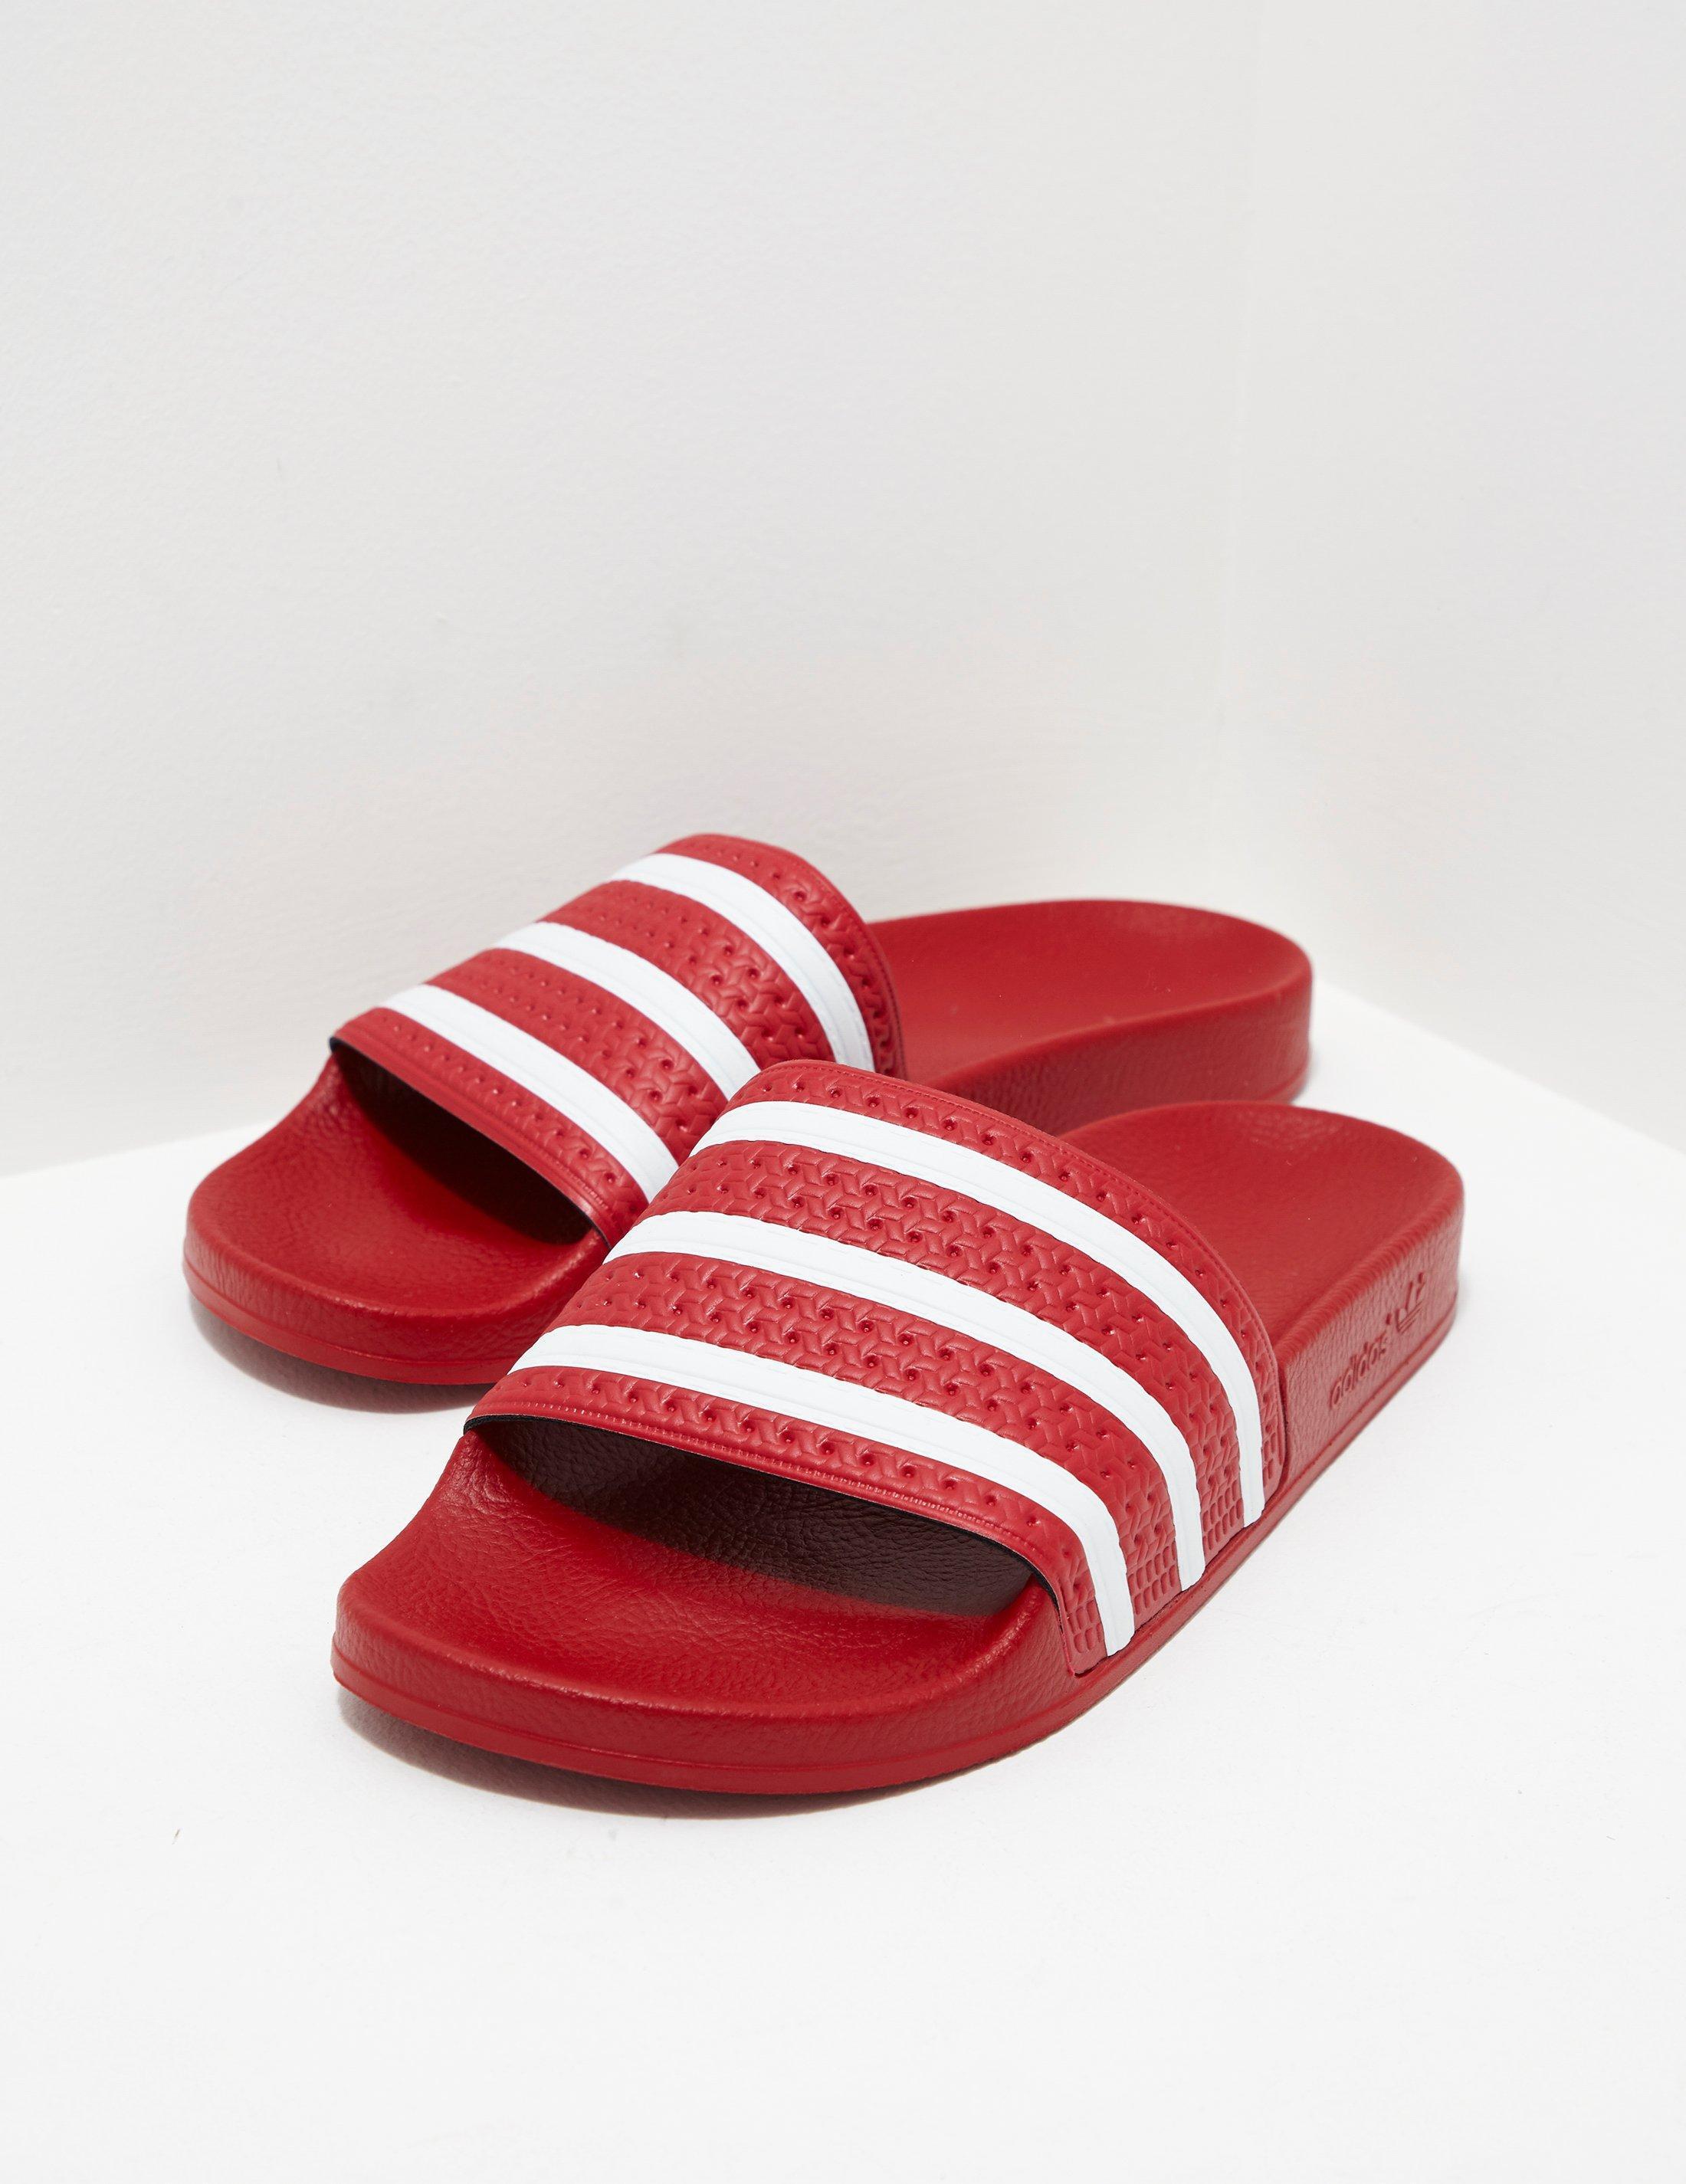 e183e9376d40e7 Lyst - adidas Originals Mens Adilette Slides Red in Red for Men